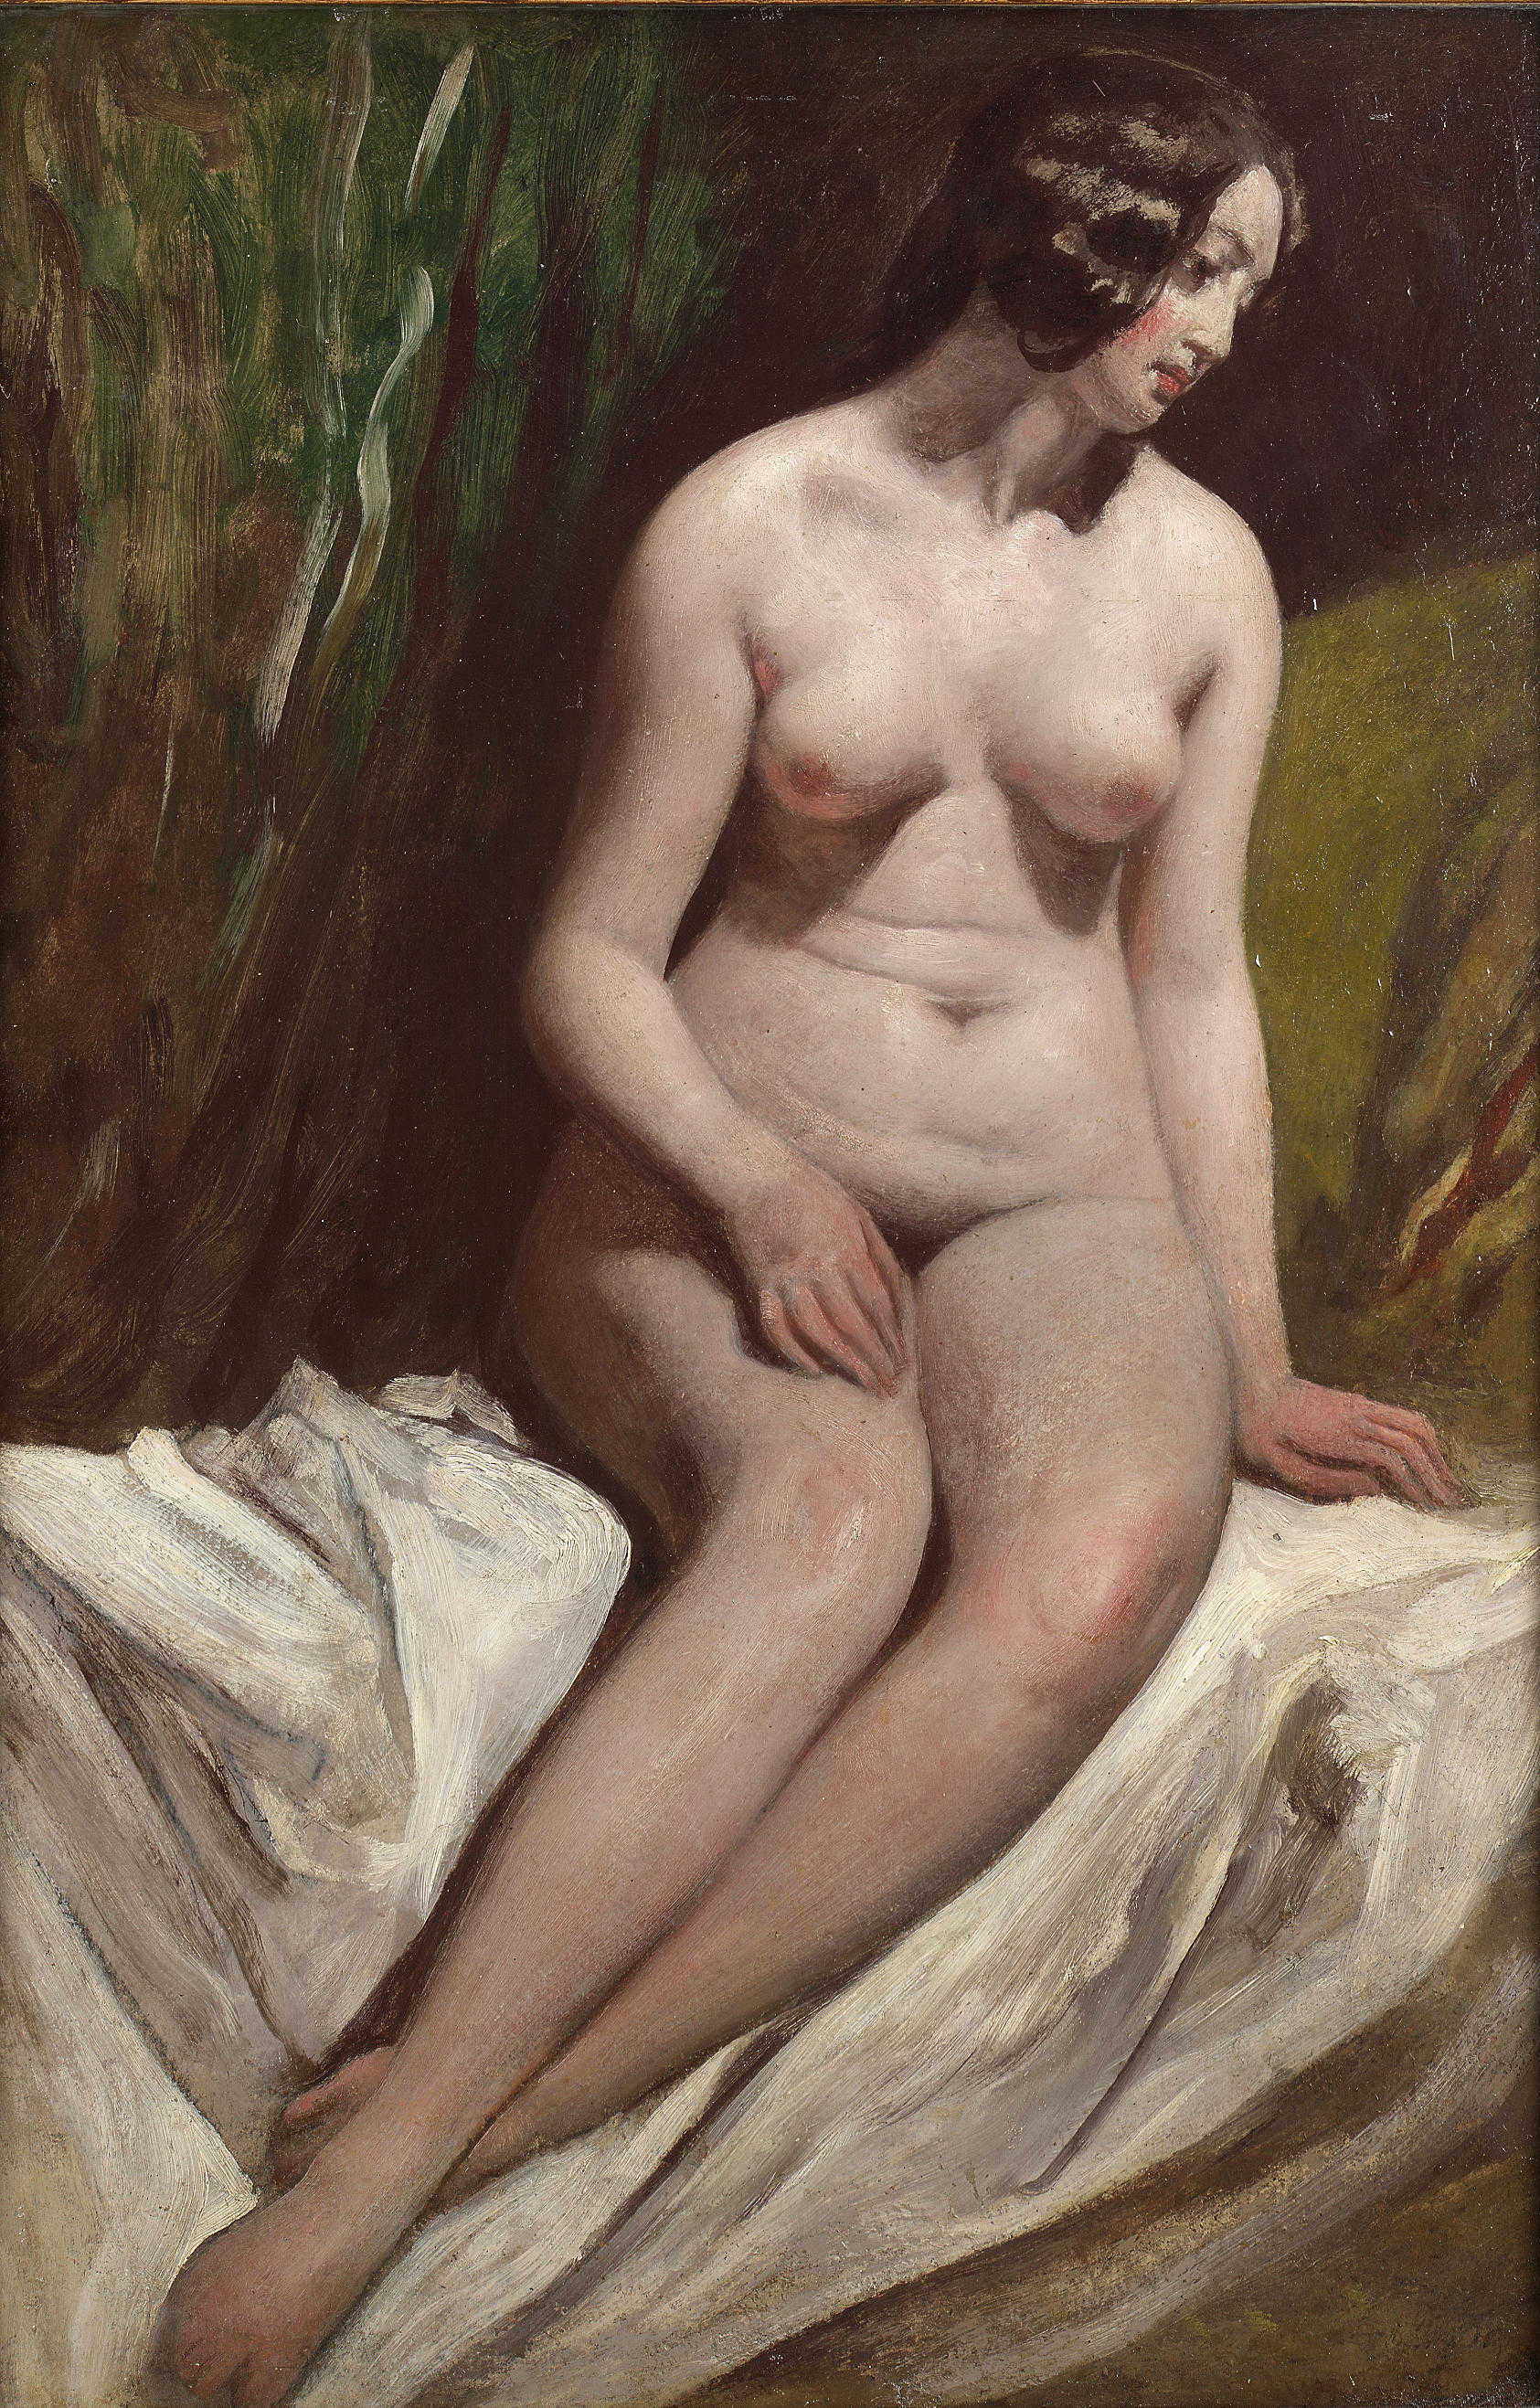 William Etty, 1787-1849. Сидящая обнаженная. 66 x 44.5 см. частная коллекция